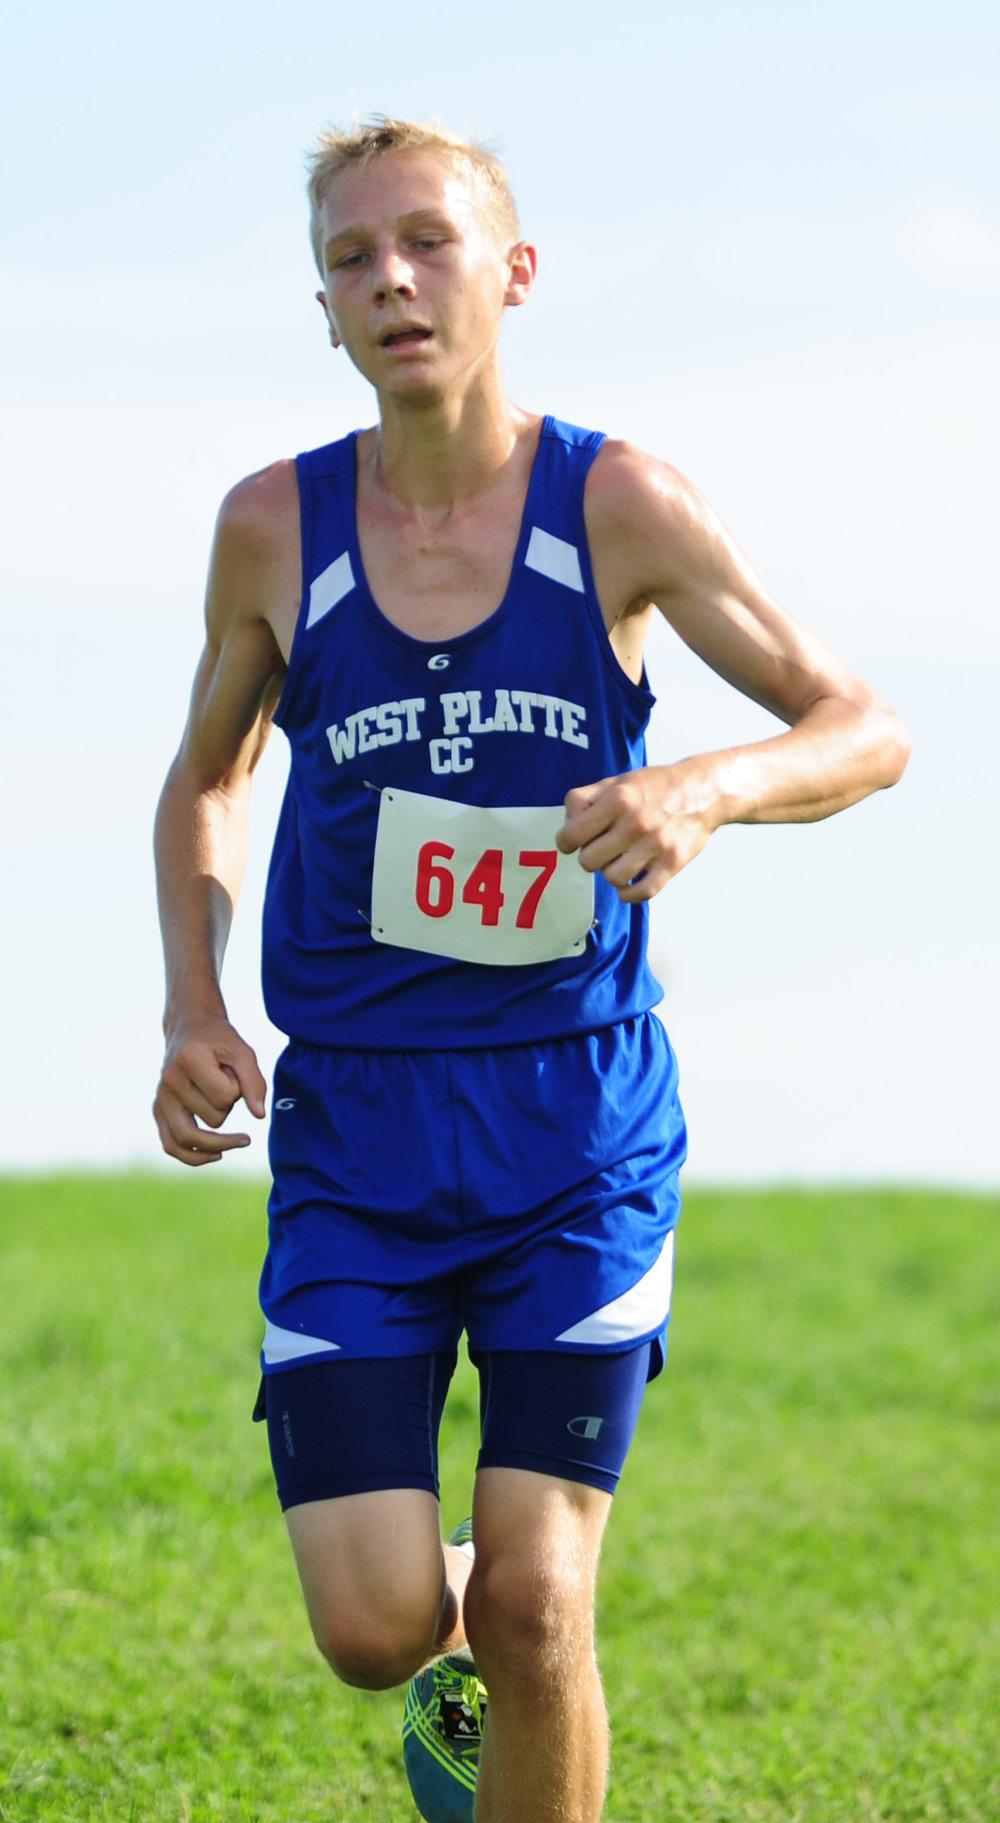 NICK INGRAM/Citizen photo West Platte sophomore Max Davies runs at Platte Ridge Park on Thursday, Sept. 15 in the Platte County Invitational.